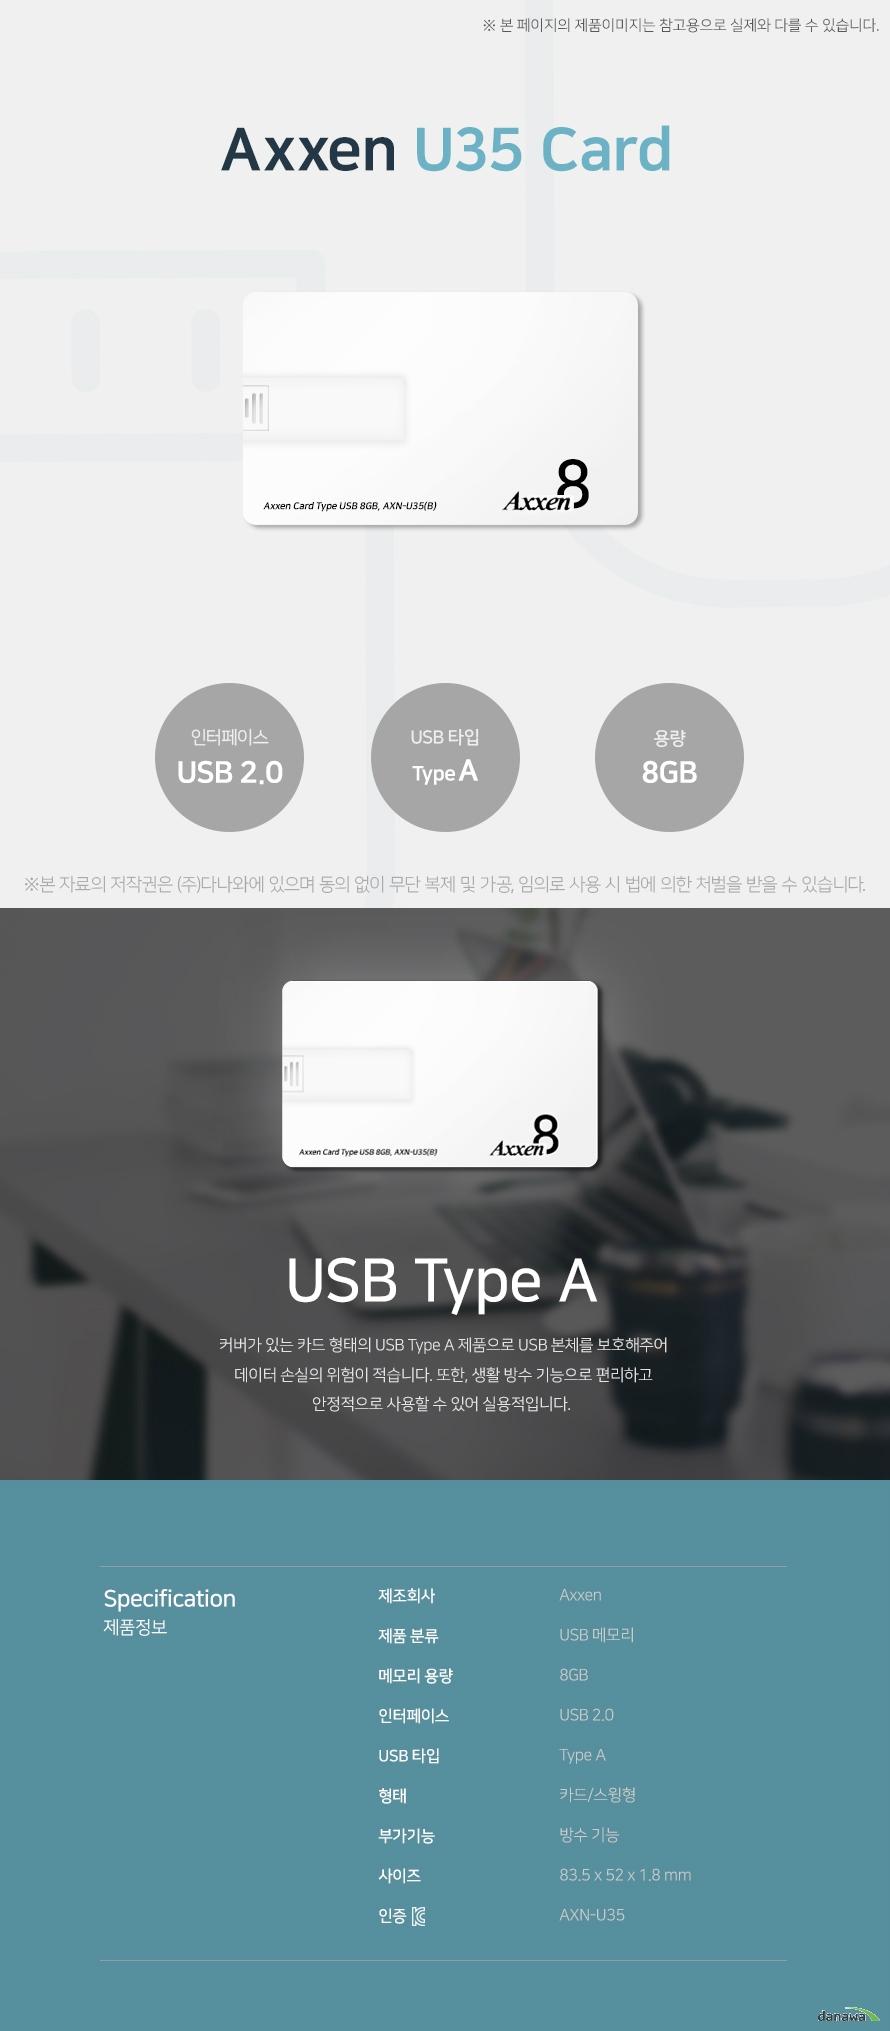 Axxen U35 Card 8GB USB Type A 커버가 있는 카드 형태의 USB Type A 제품으로 USB 본체를 보호해주어 데이터 손실의   의험이 적습니다. 또한, 생활 방수 기능으로 편리하고 안정적으로 사용할 수 있어 실용적입니다. 스펙 제조회사 AXXEN 제품 분류 USB 메모리 메모리 용량 8GB 인터페이스 USB 2.0 USB 타입 Type A 형태 카드/스윙형 부가기능 방수 기능 사이즈 83.5x52x1.8mm KC인증 AXN-U35